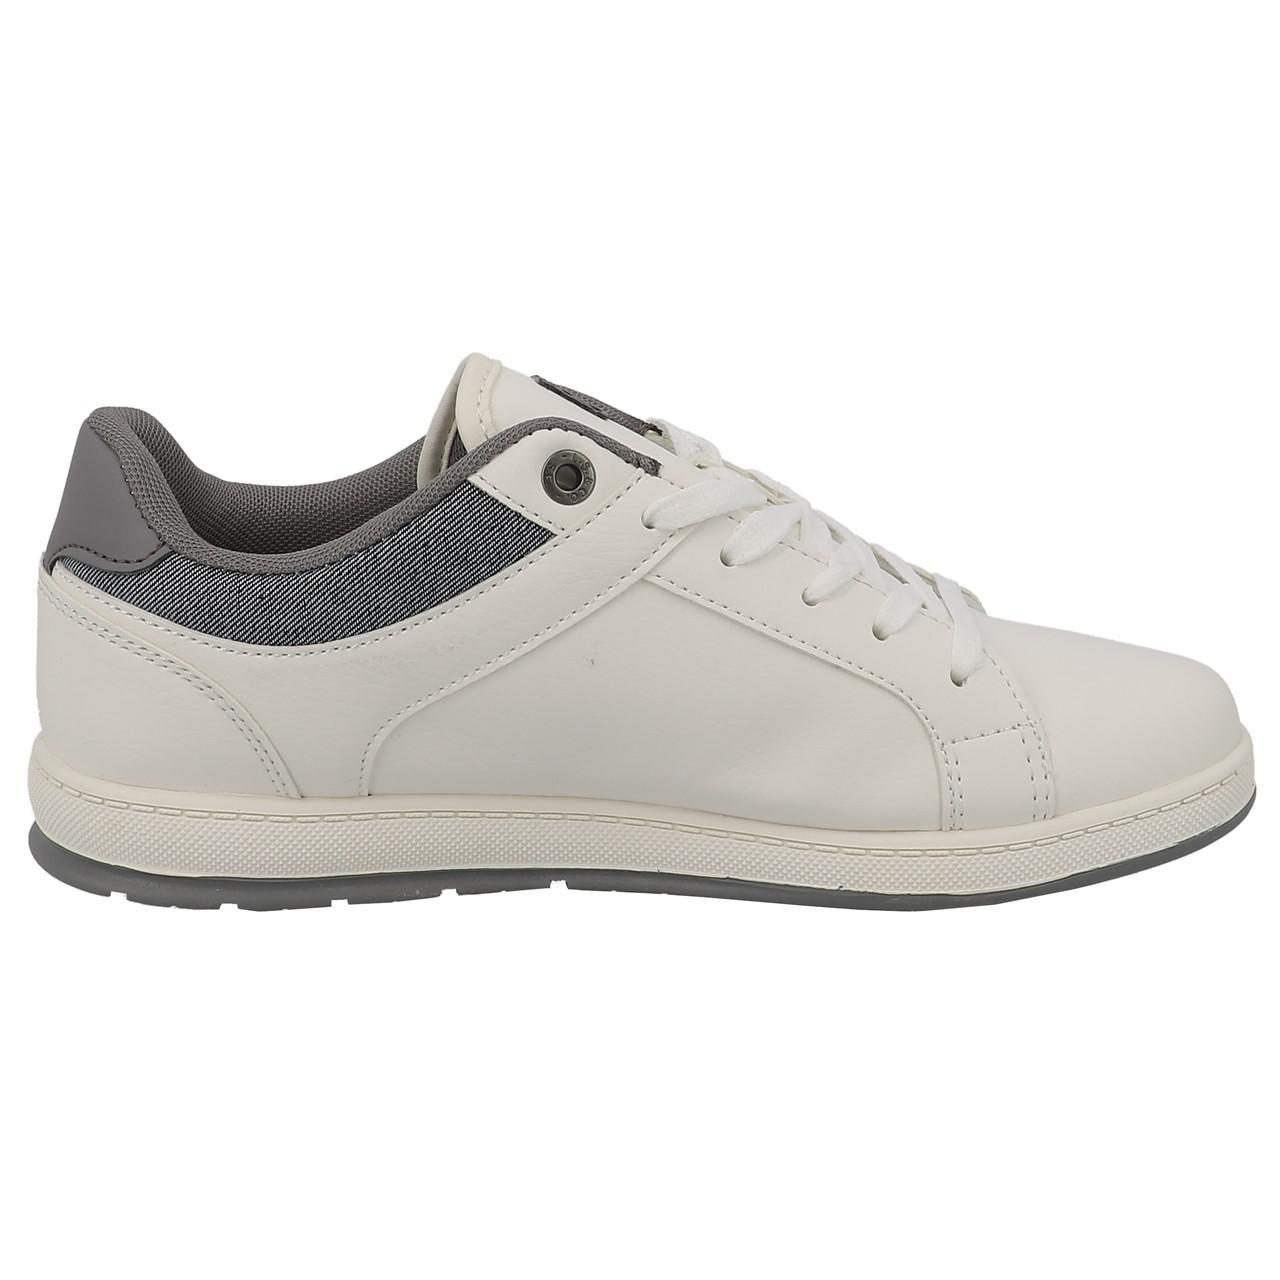 Chaussures-mode-ville-Levis-Declan-blanc-Blanc-53197-Neuf miniature 4